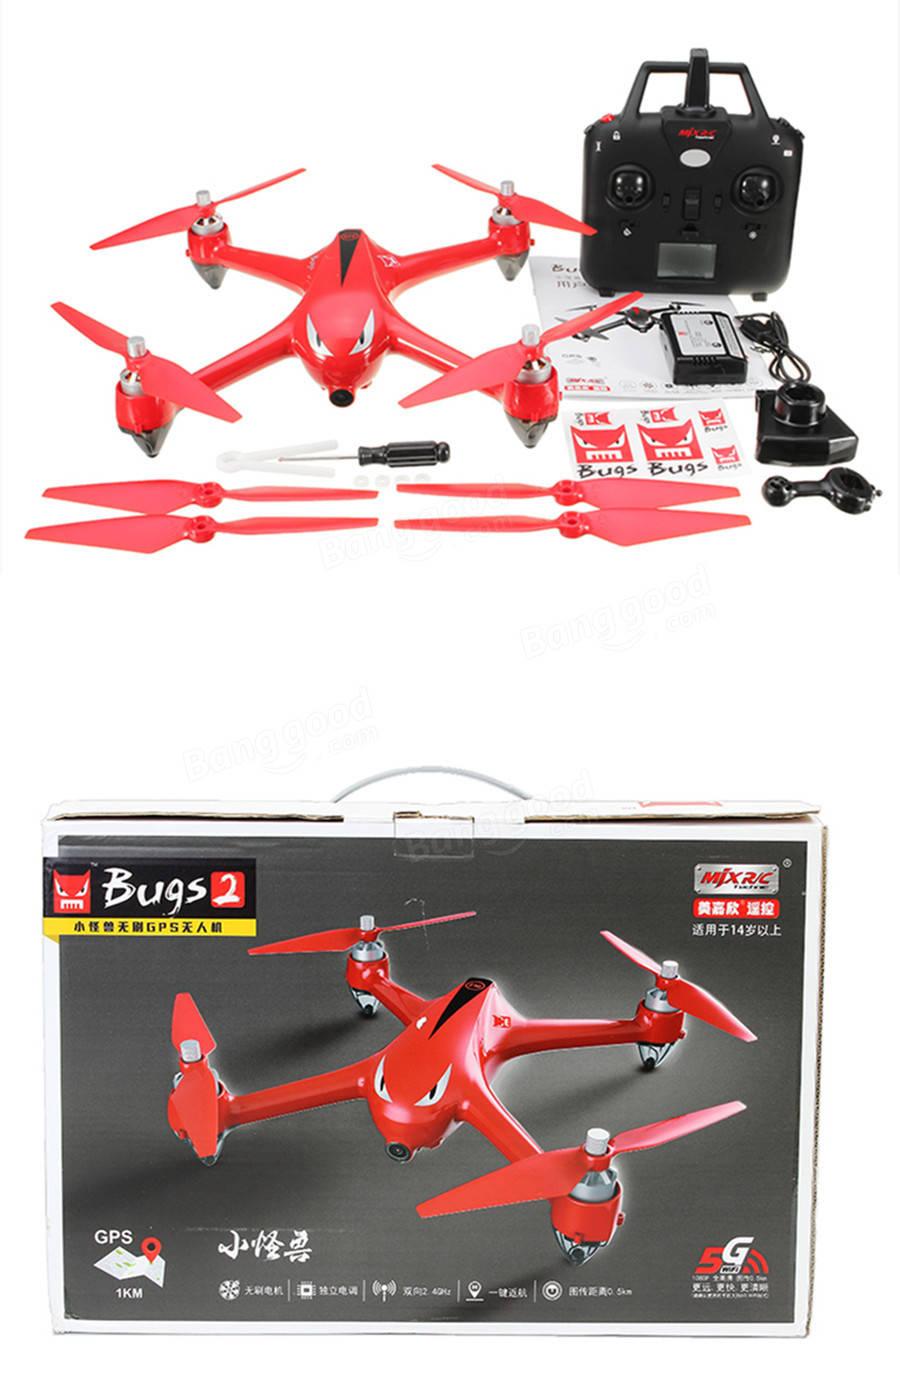 MJX B2W Bugs 2W WiFi FPV sin escobillas con cámara 1080P HD GPS RC Drone Quadcopter RTF